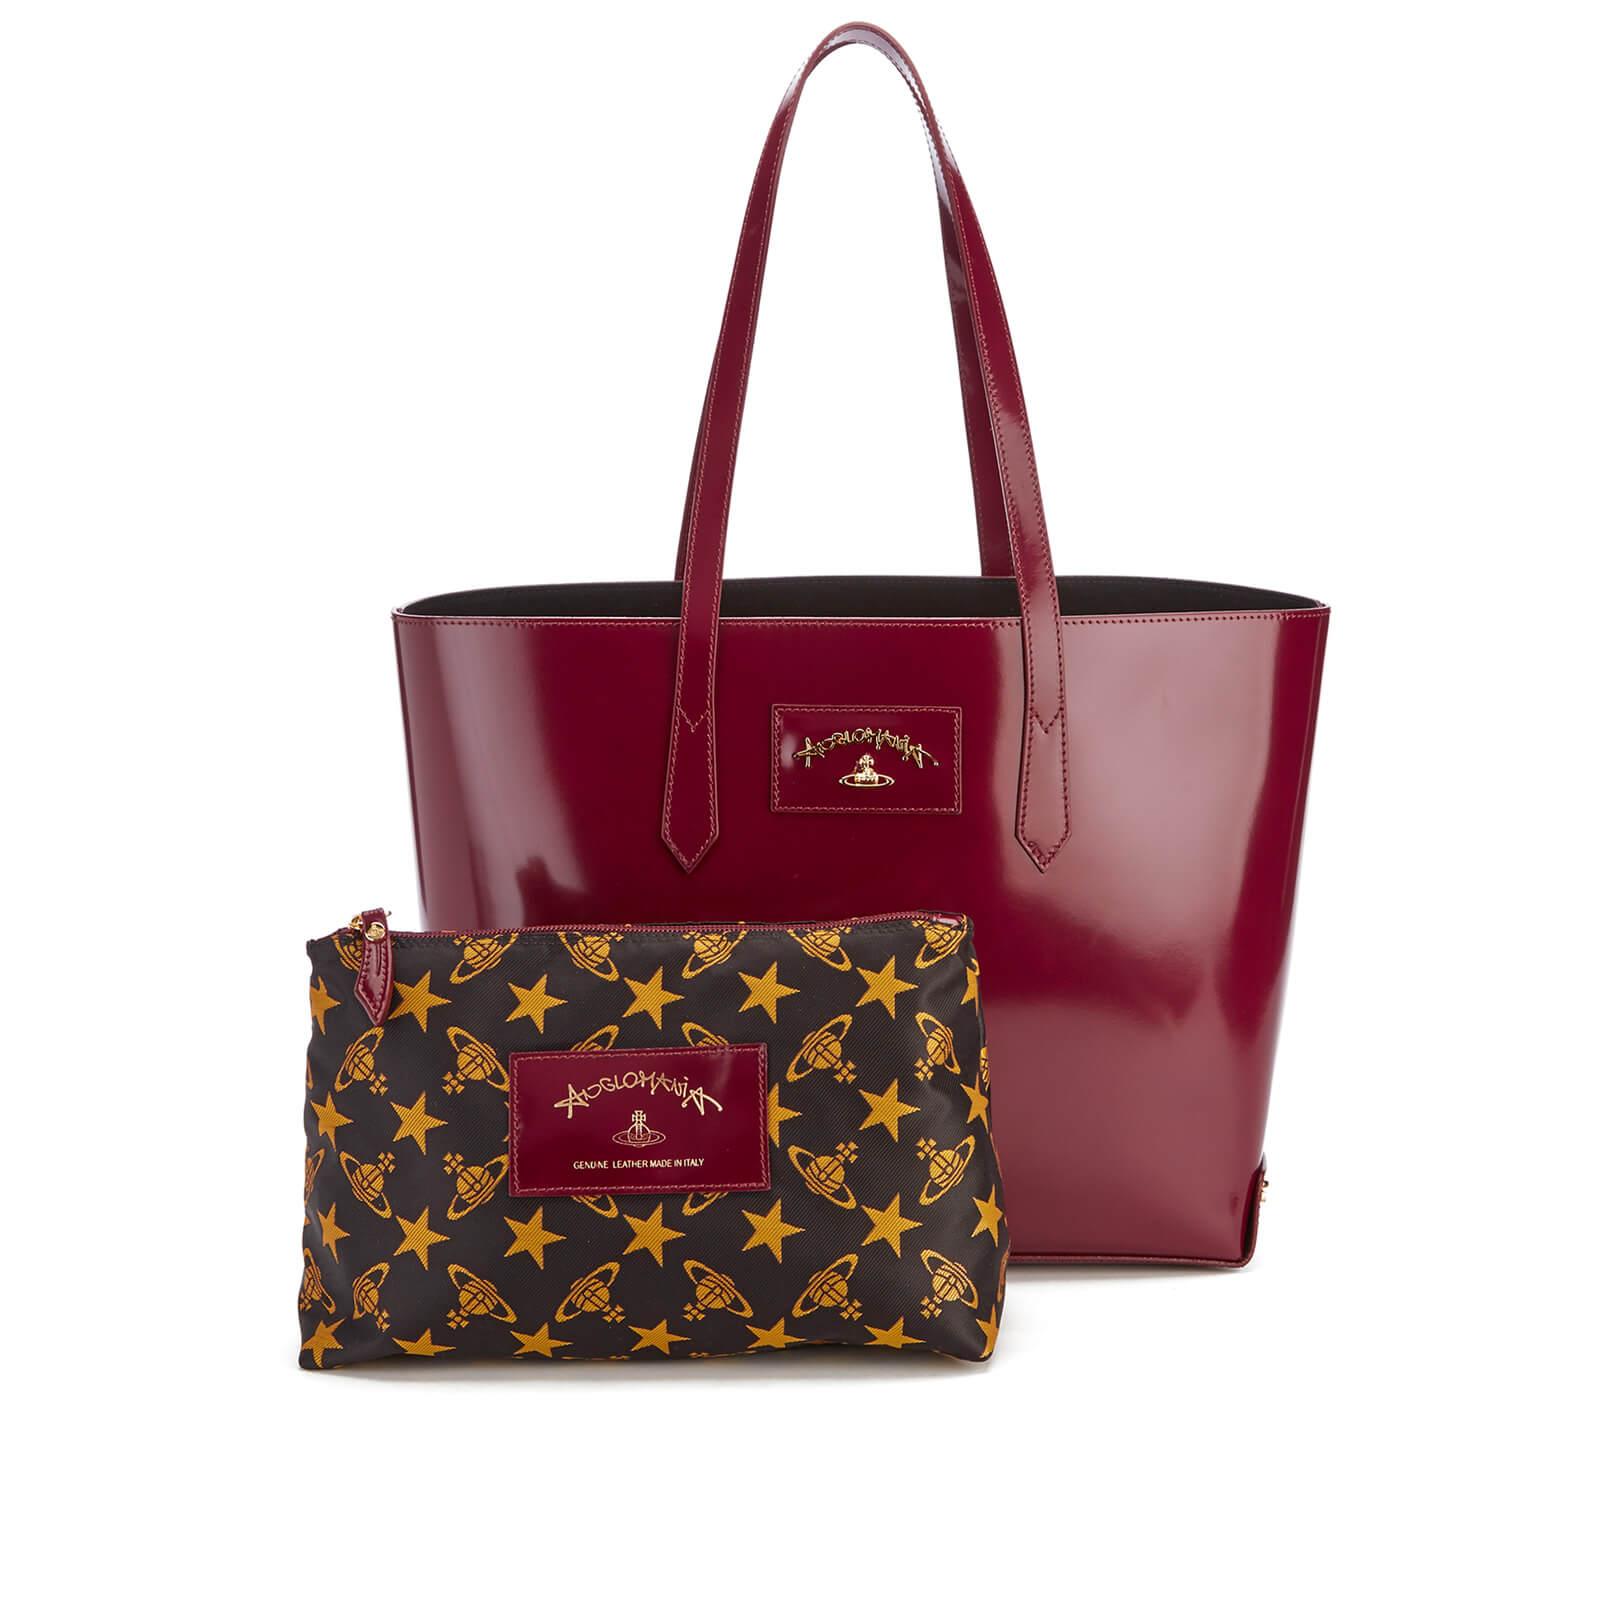 b0108b9da4 Vivienne Westwood Women's Newcastle Stud Tote Bag - Bordeaux - Free UK  Delivery over £50